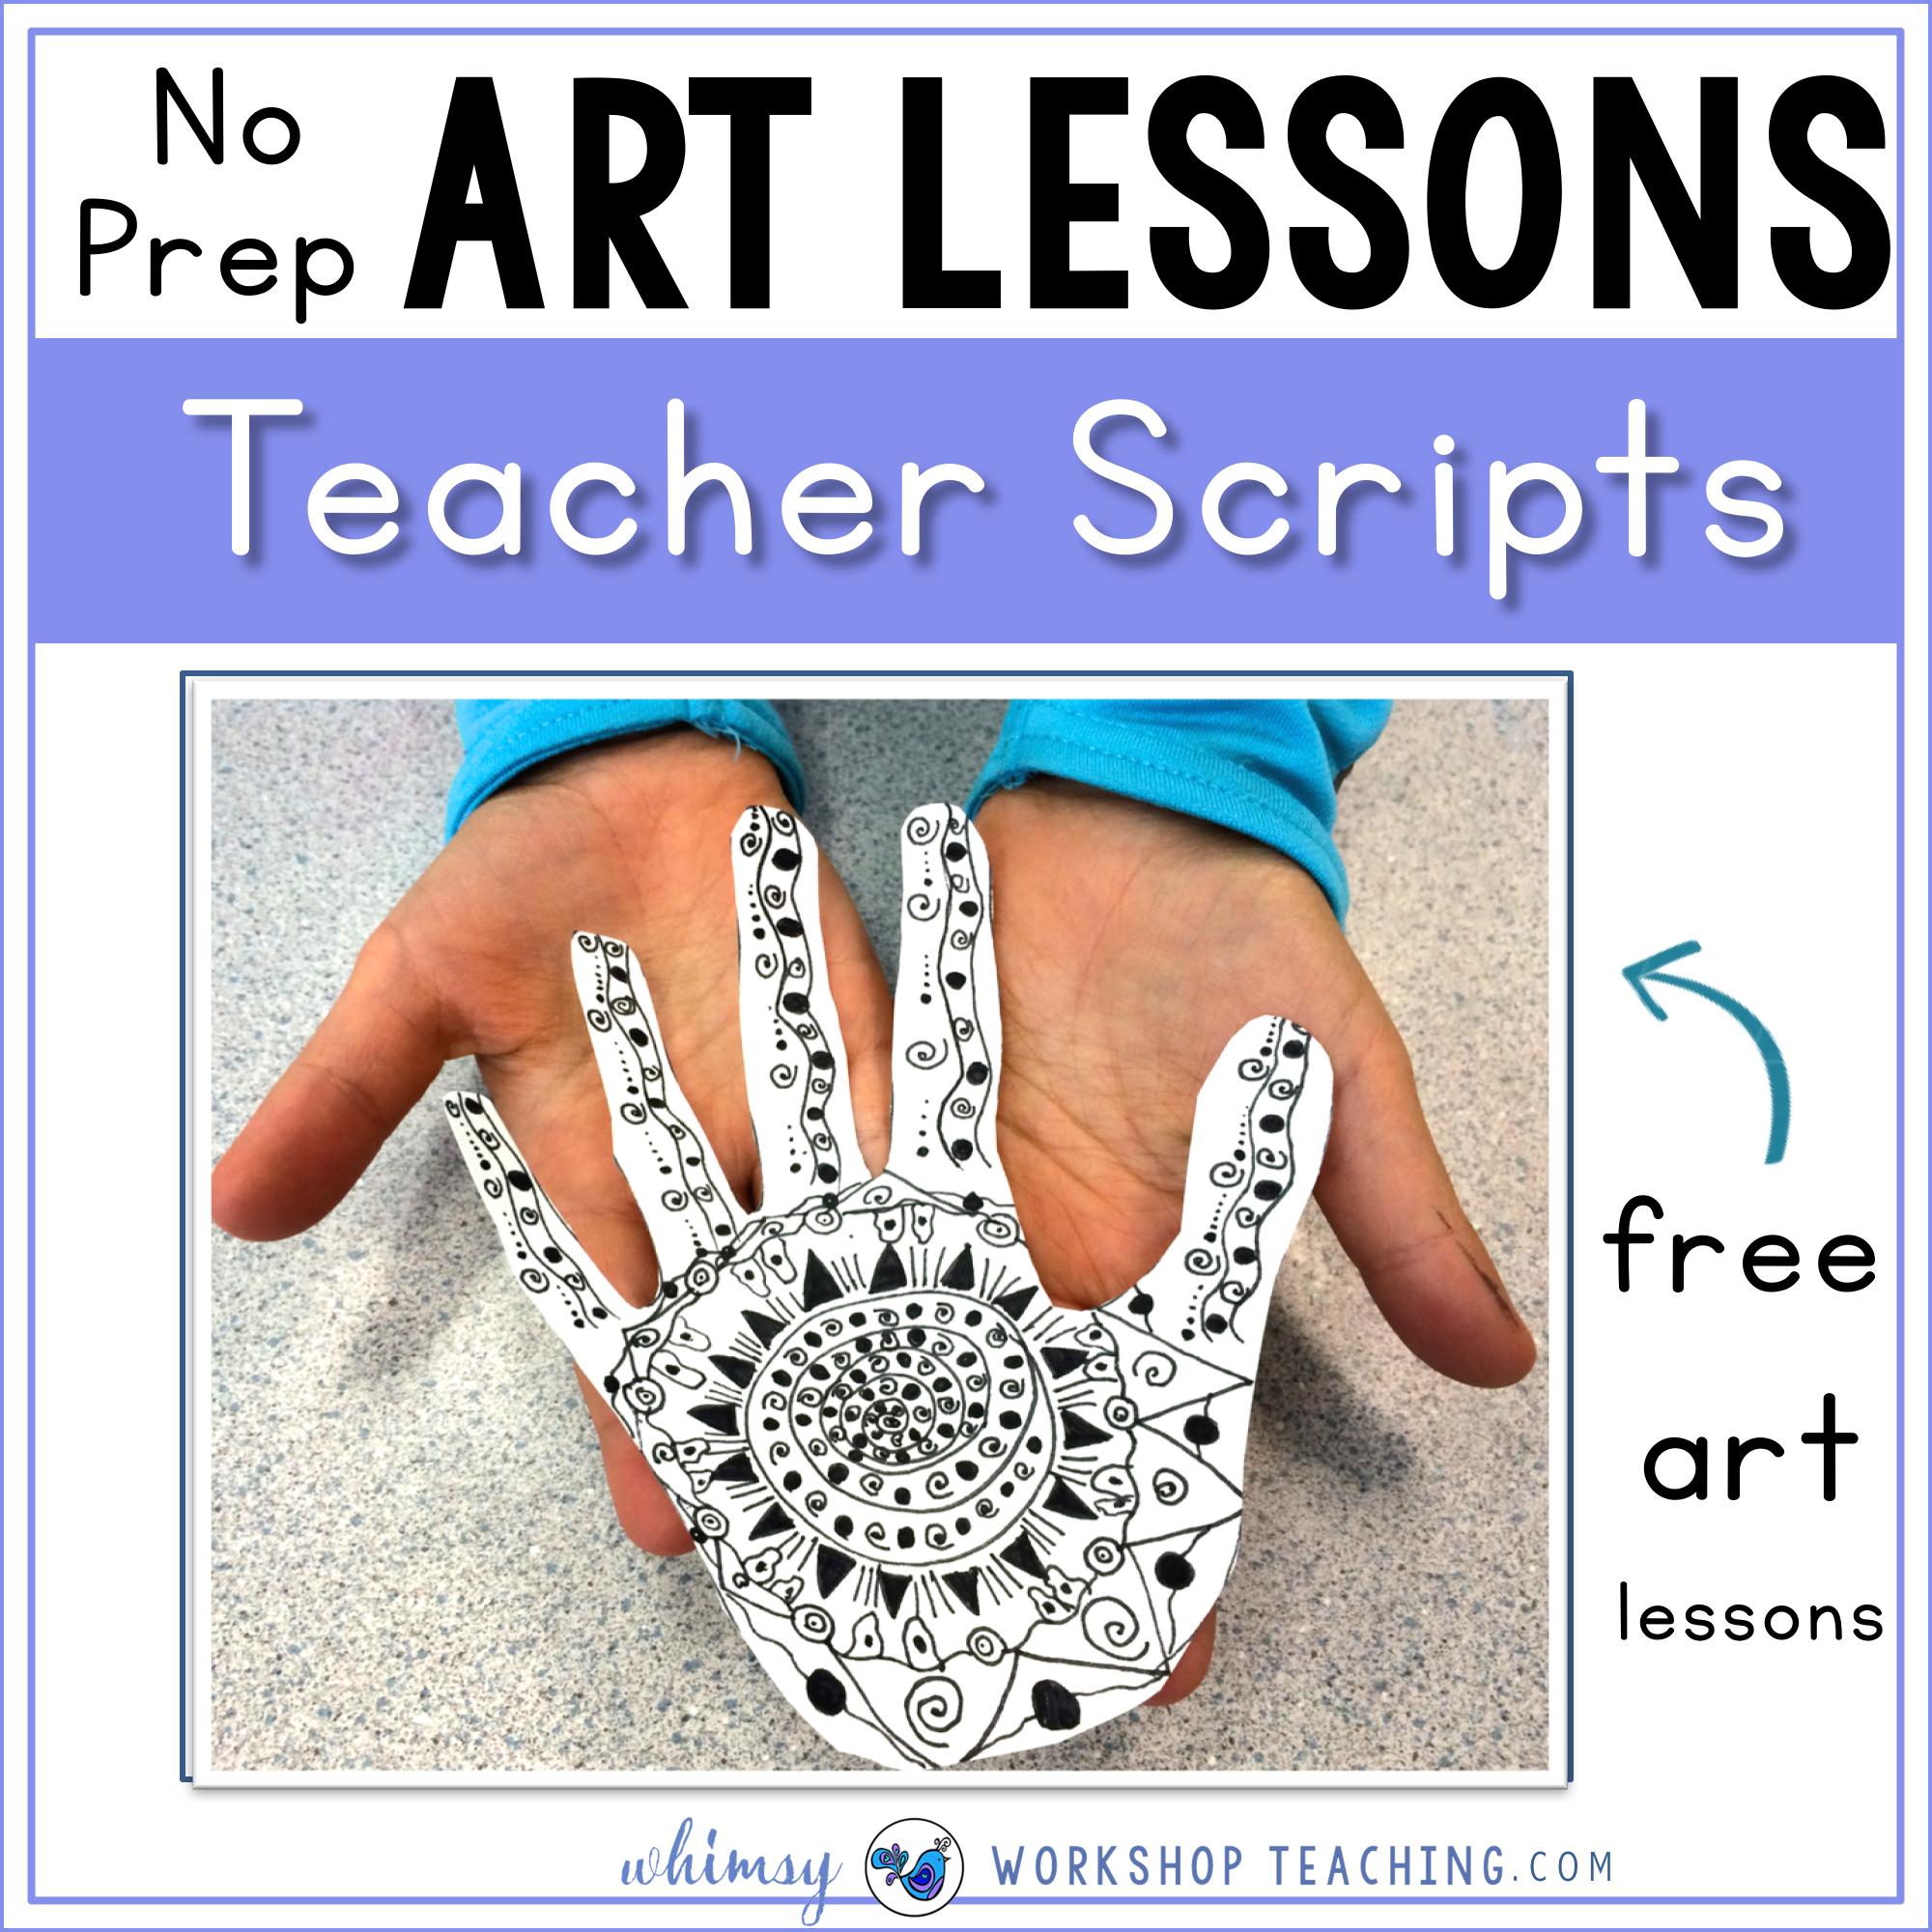 No prep art lessons using read aloud scripts